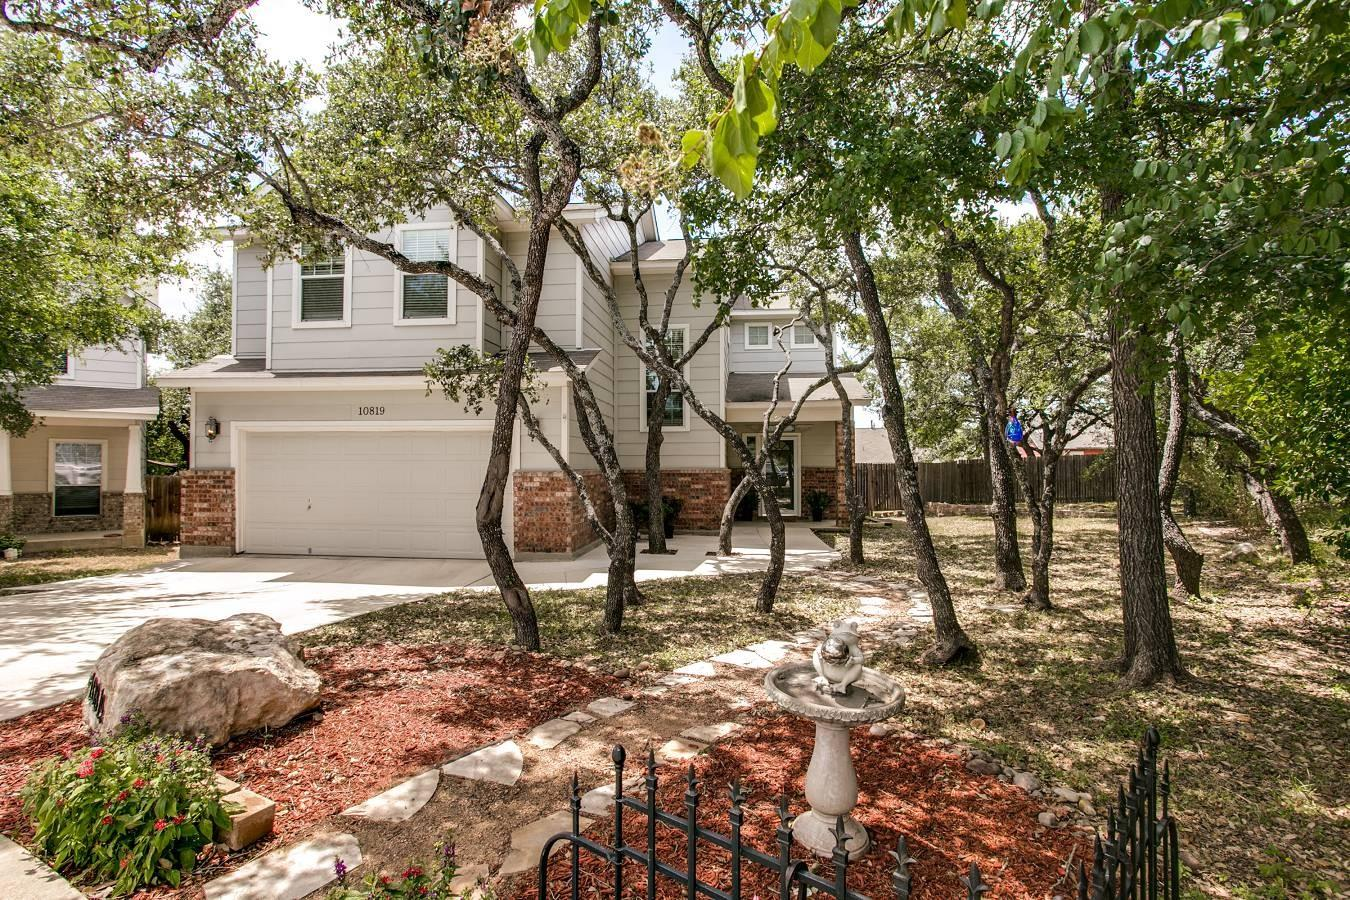 10819 Sierra Ridge Dr, San Antonio, TX 78245 - Estimate and Home ...